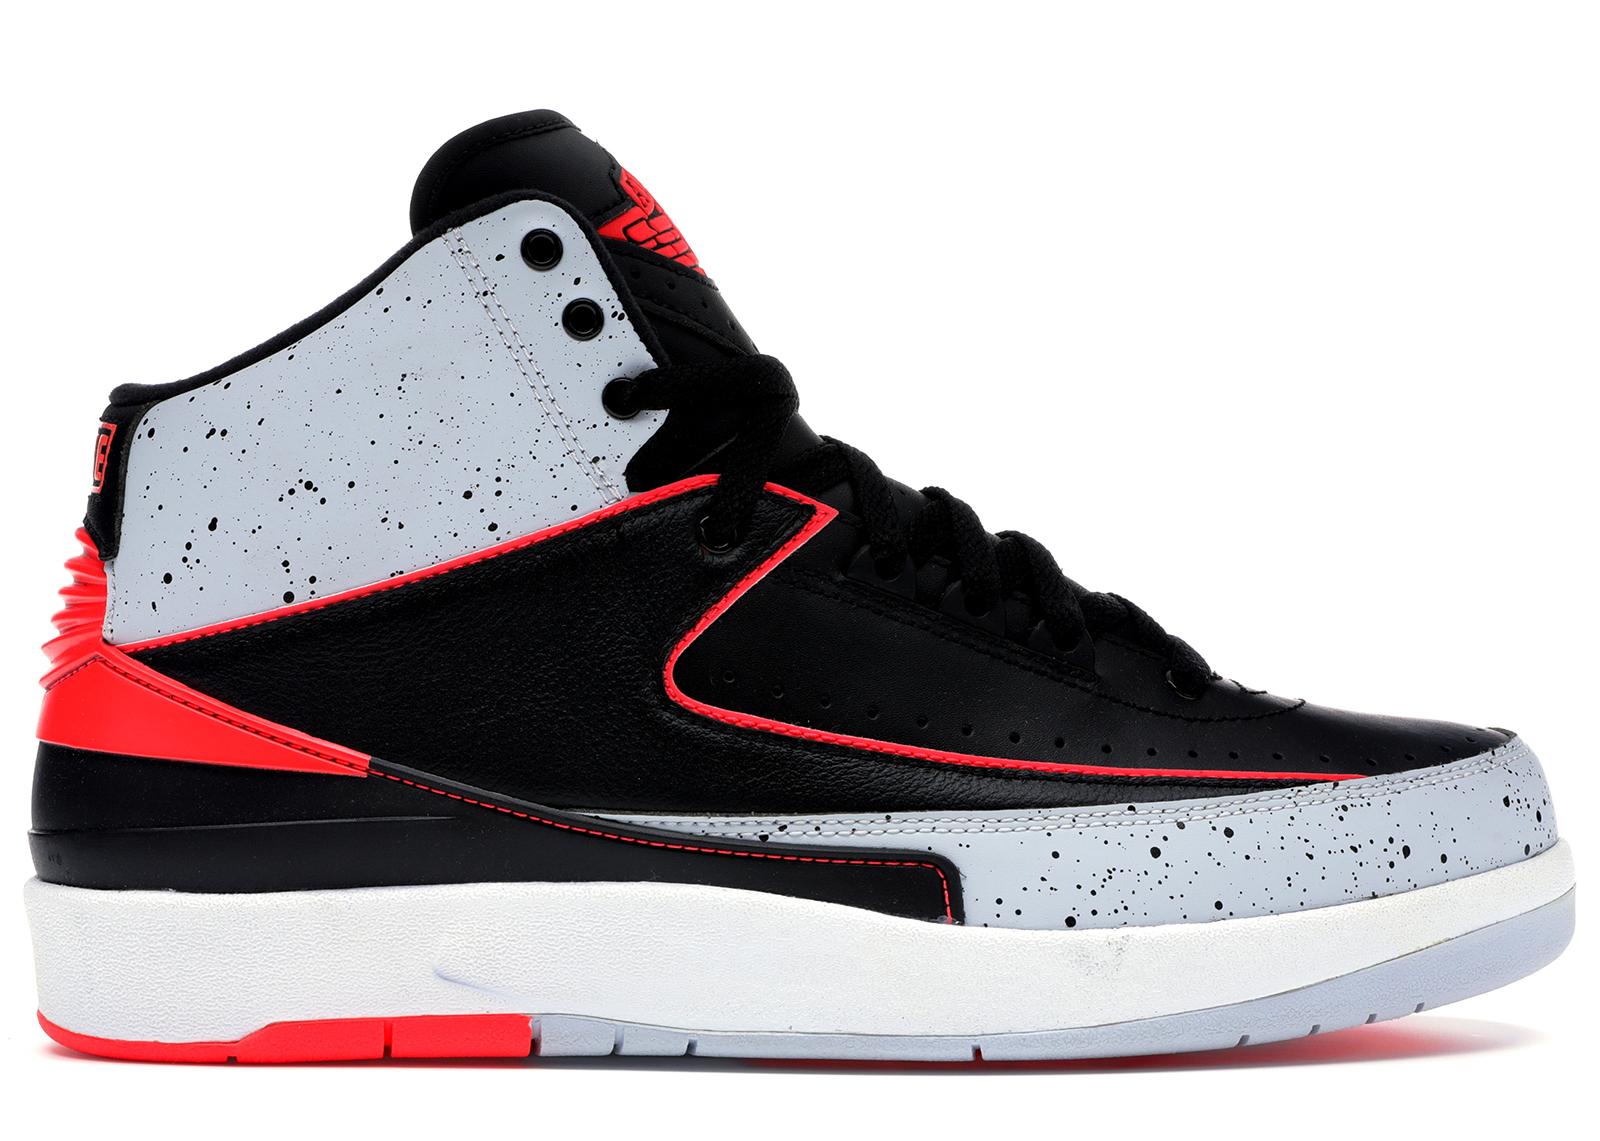 Buy Air Jordan 2 Shoes & Deadstock Sneakers